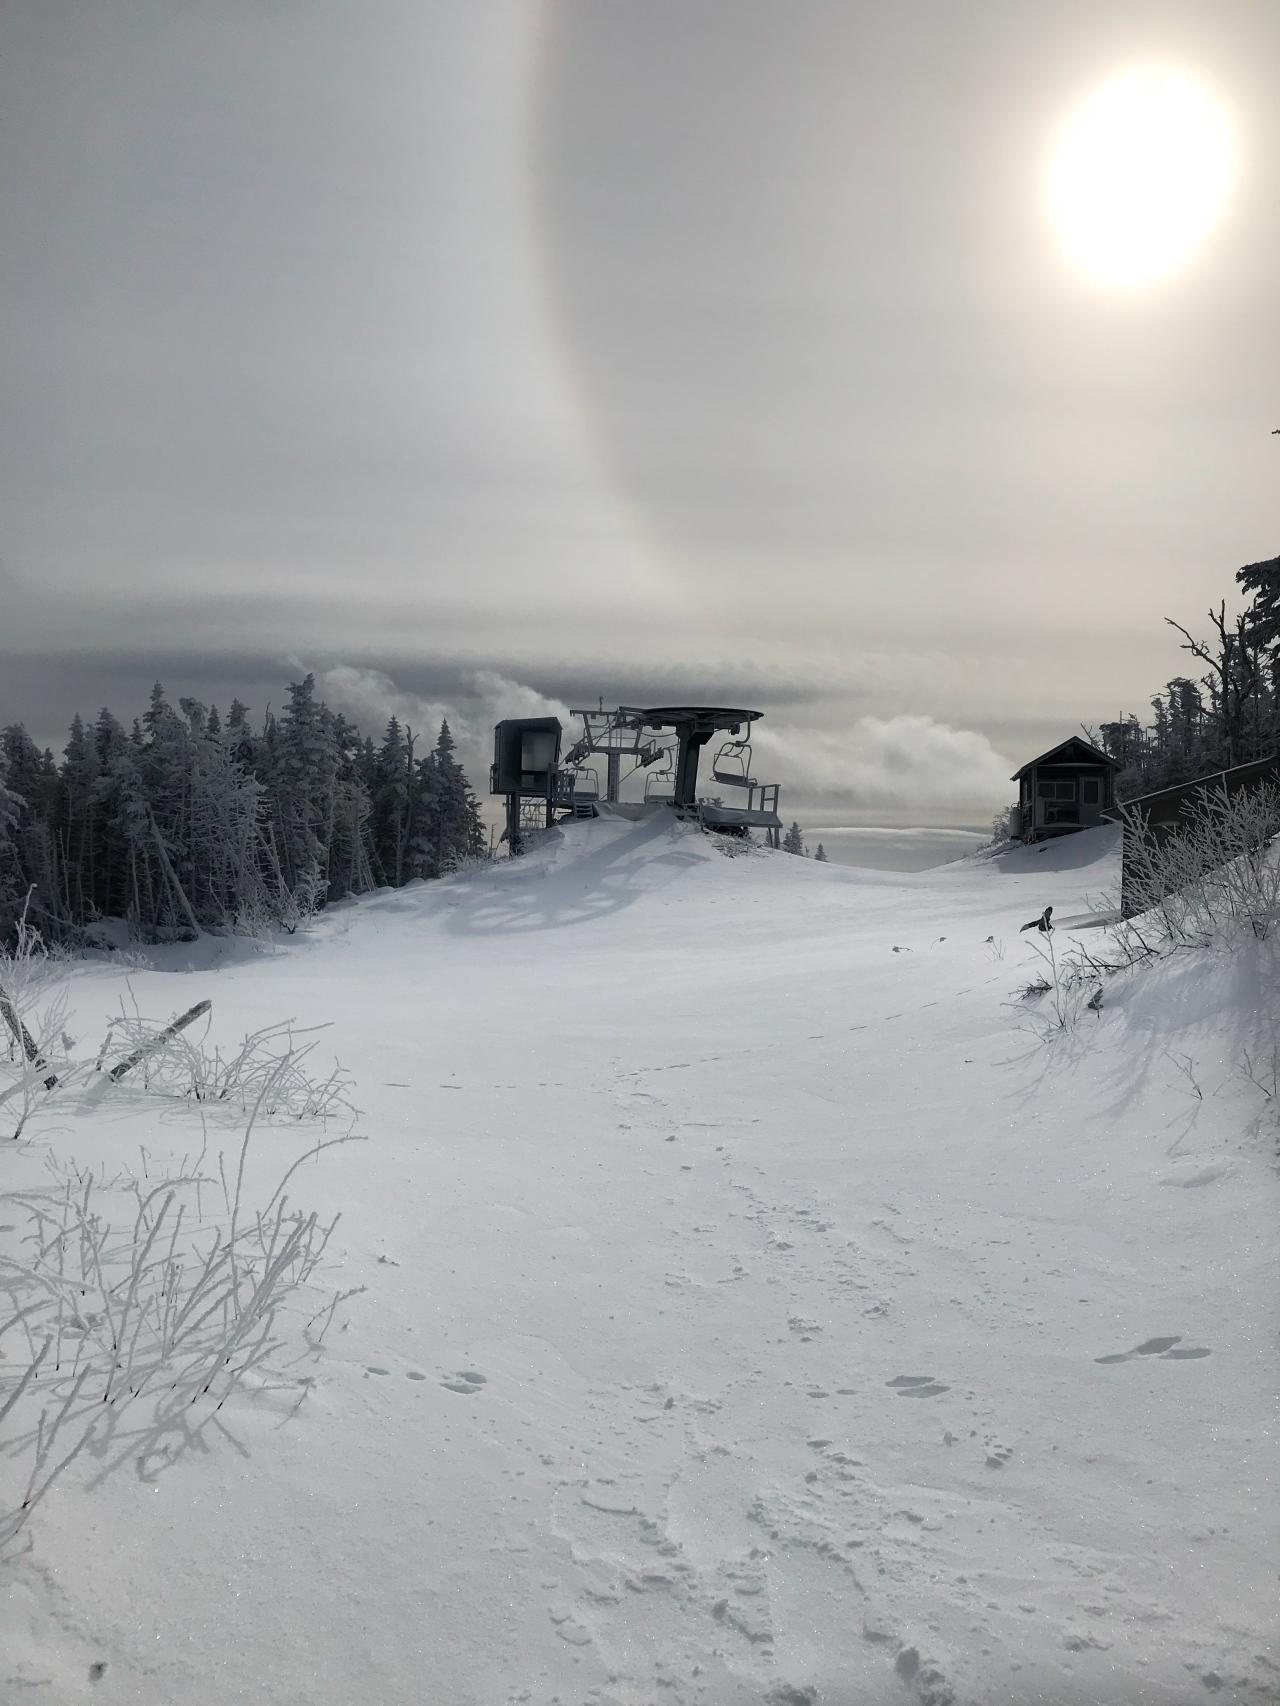 Whiteface Ski Lift